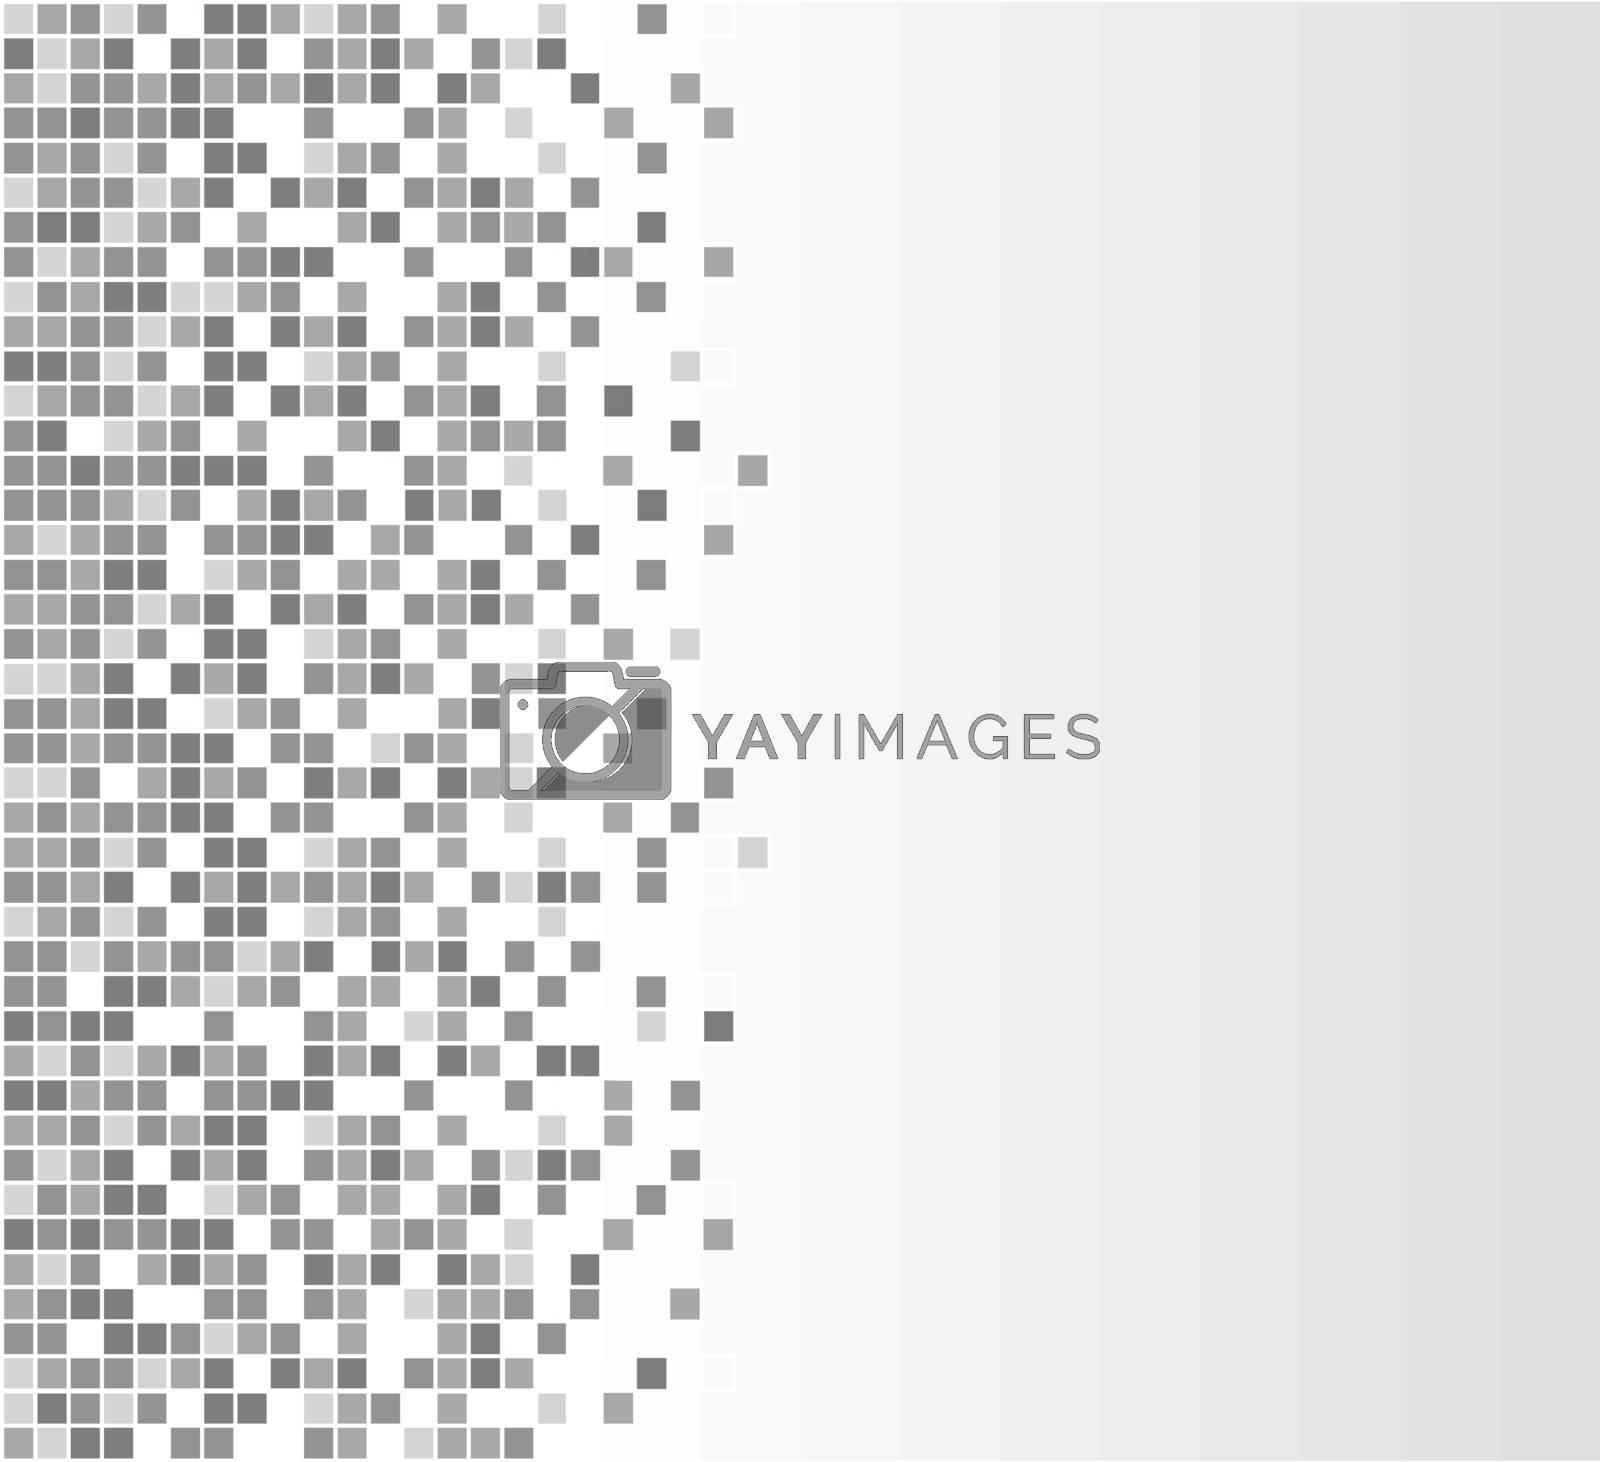 Royalty free image of gray pixels background by nickylarson974